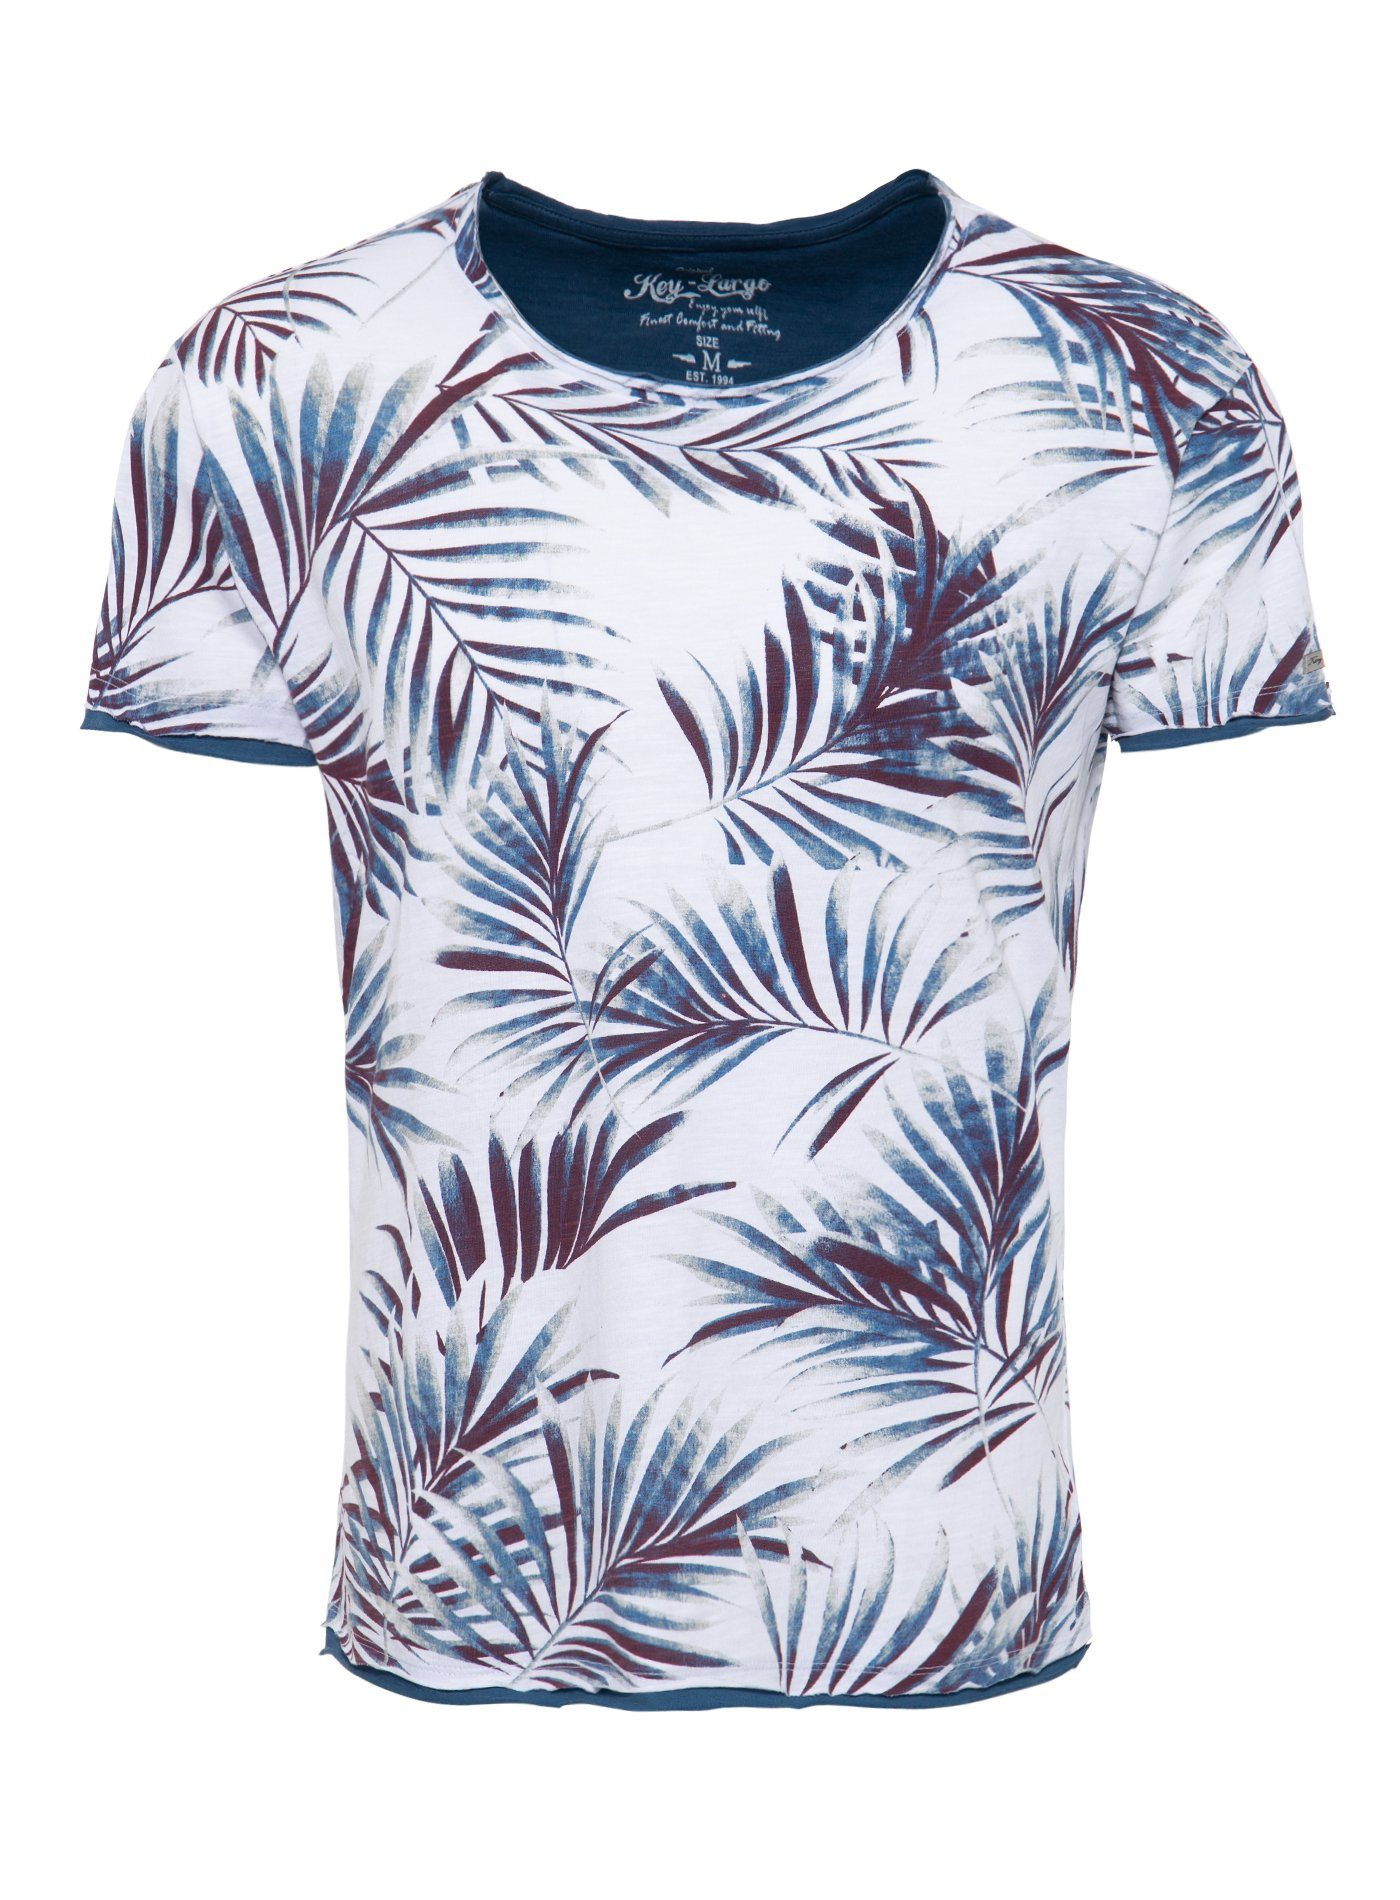 Paola Tunika Shirt lila glam Pailletten Gr 52 NEU Viskose 3//4 Arm 53d